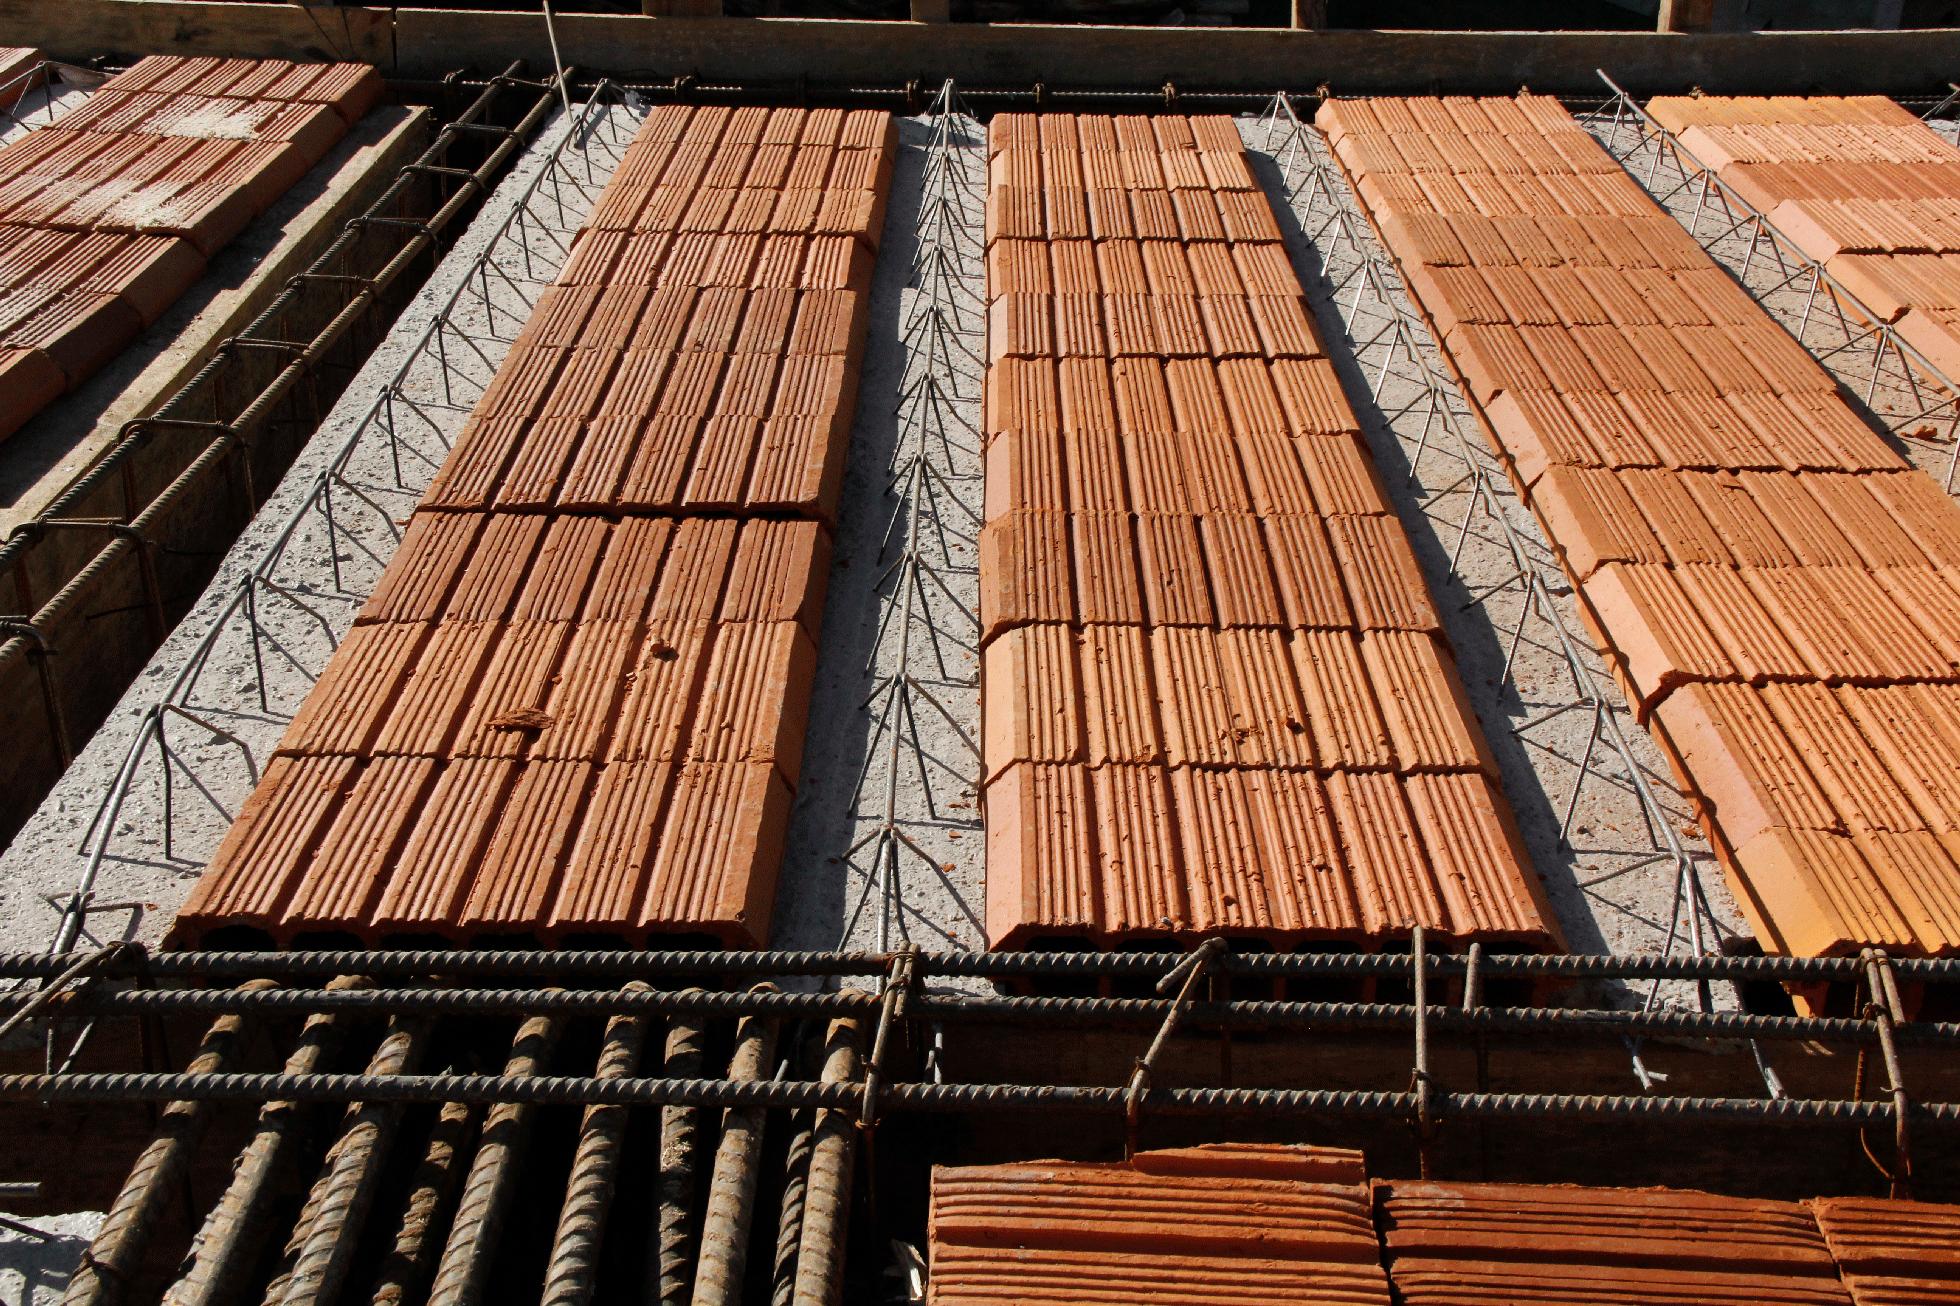 fabrica-laje-trelicada